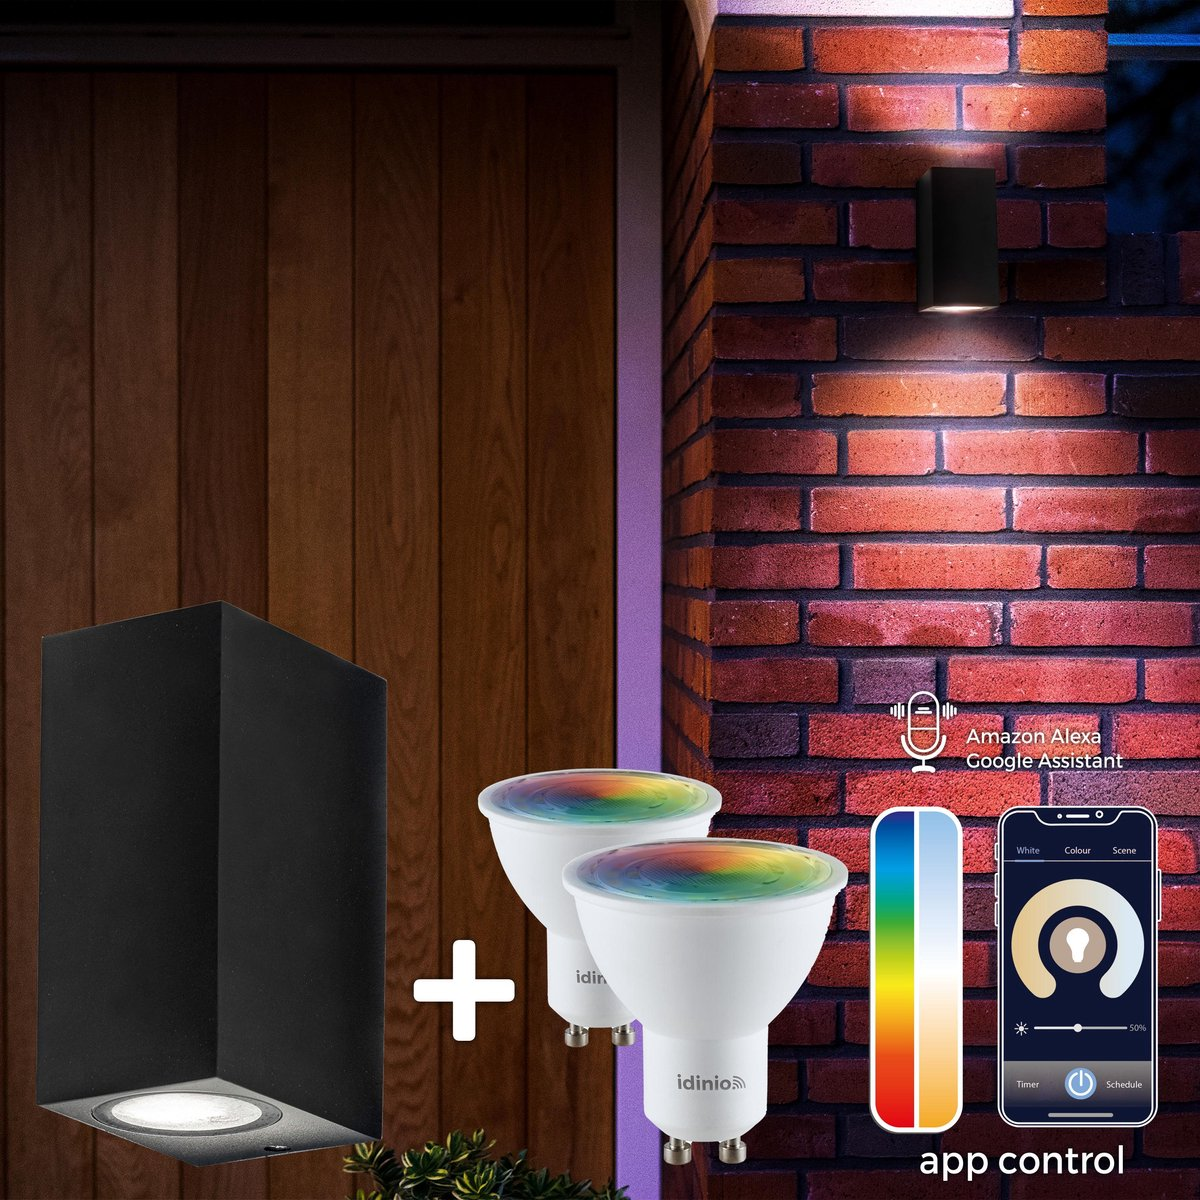 Proventa Slimme buitenlamp - Wandlamp Model R - White & Color - 1 x LED Muurlamp